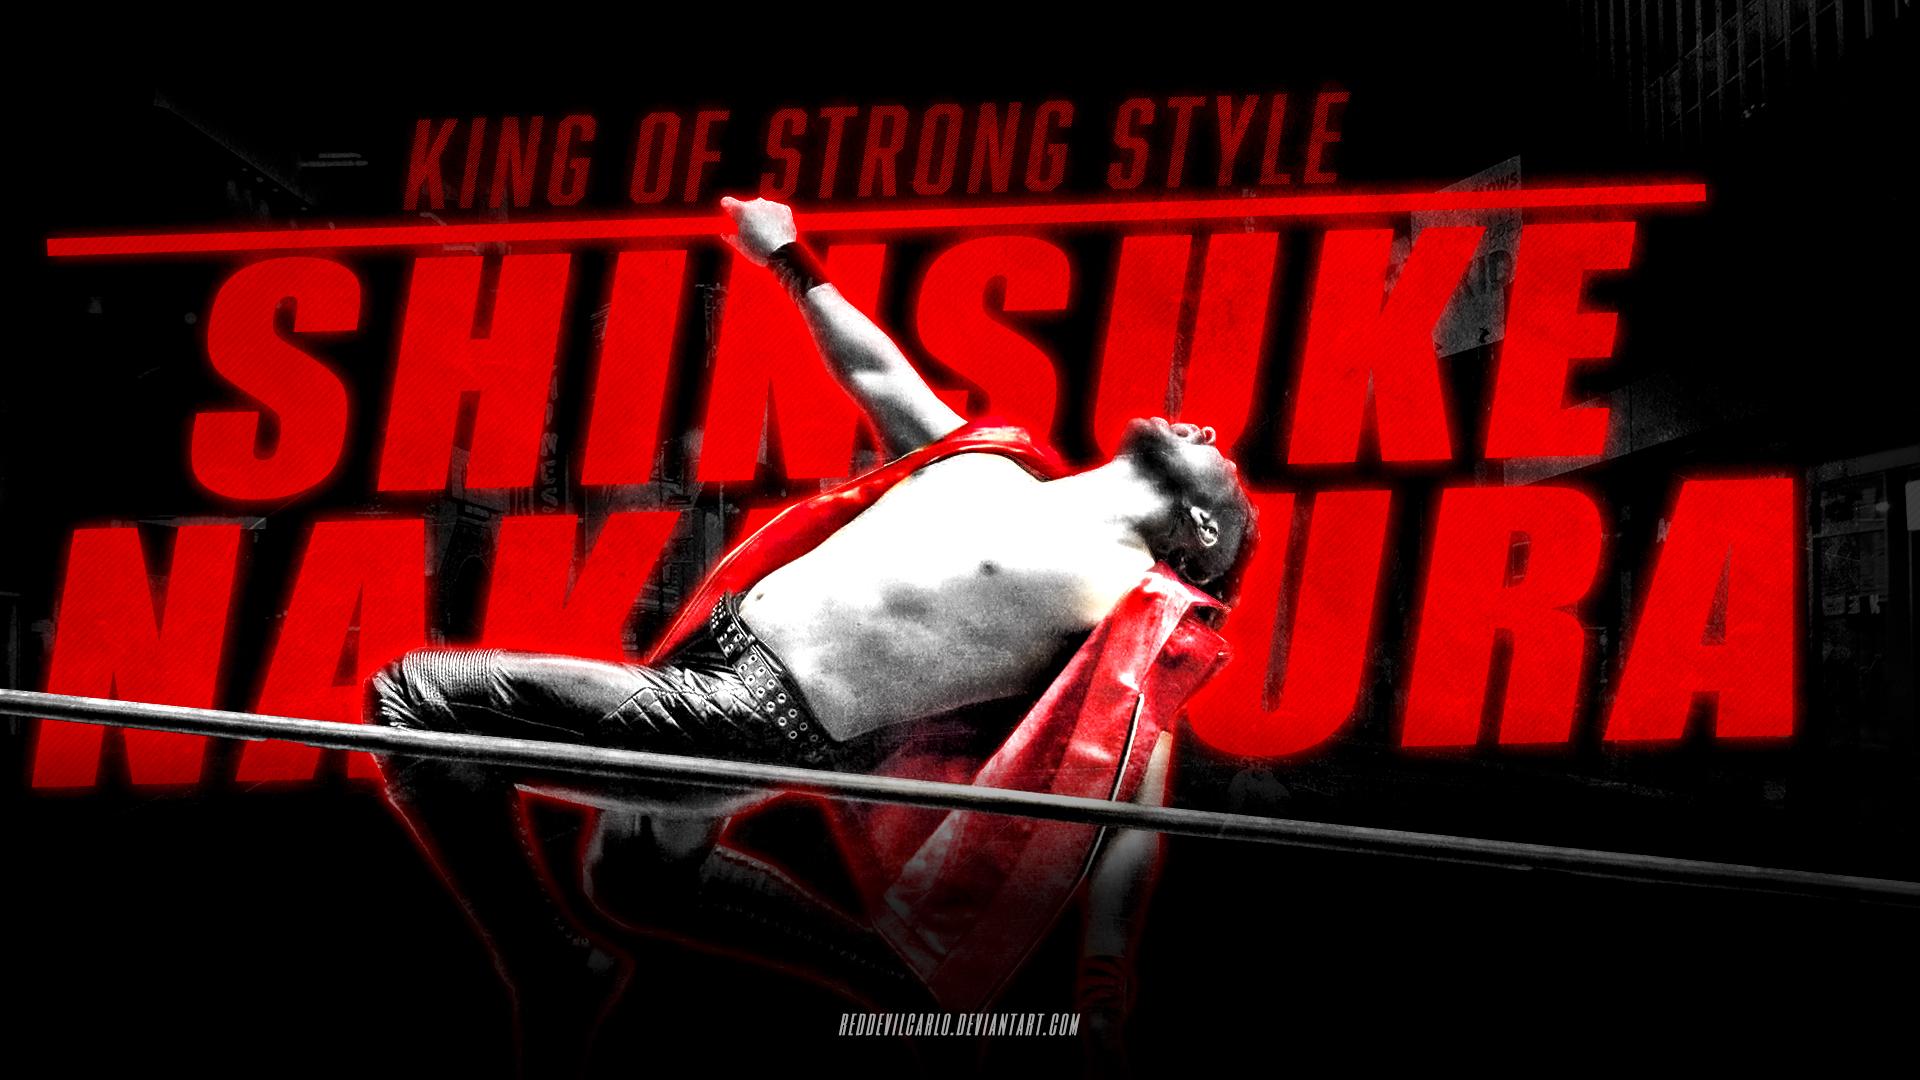 [Imagem: shinsuke_nakamura___king_of_strong_style...9xygop.jpg]